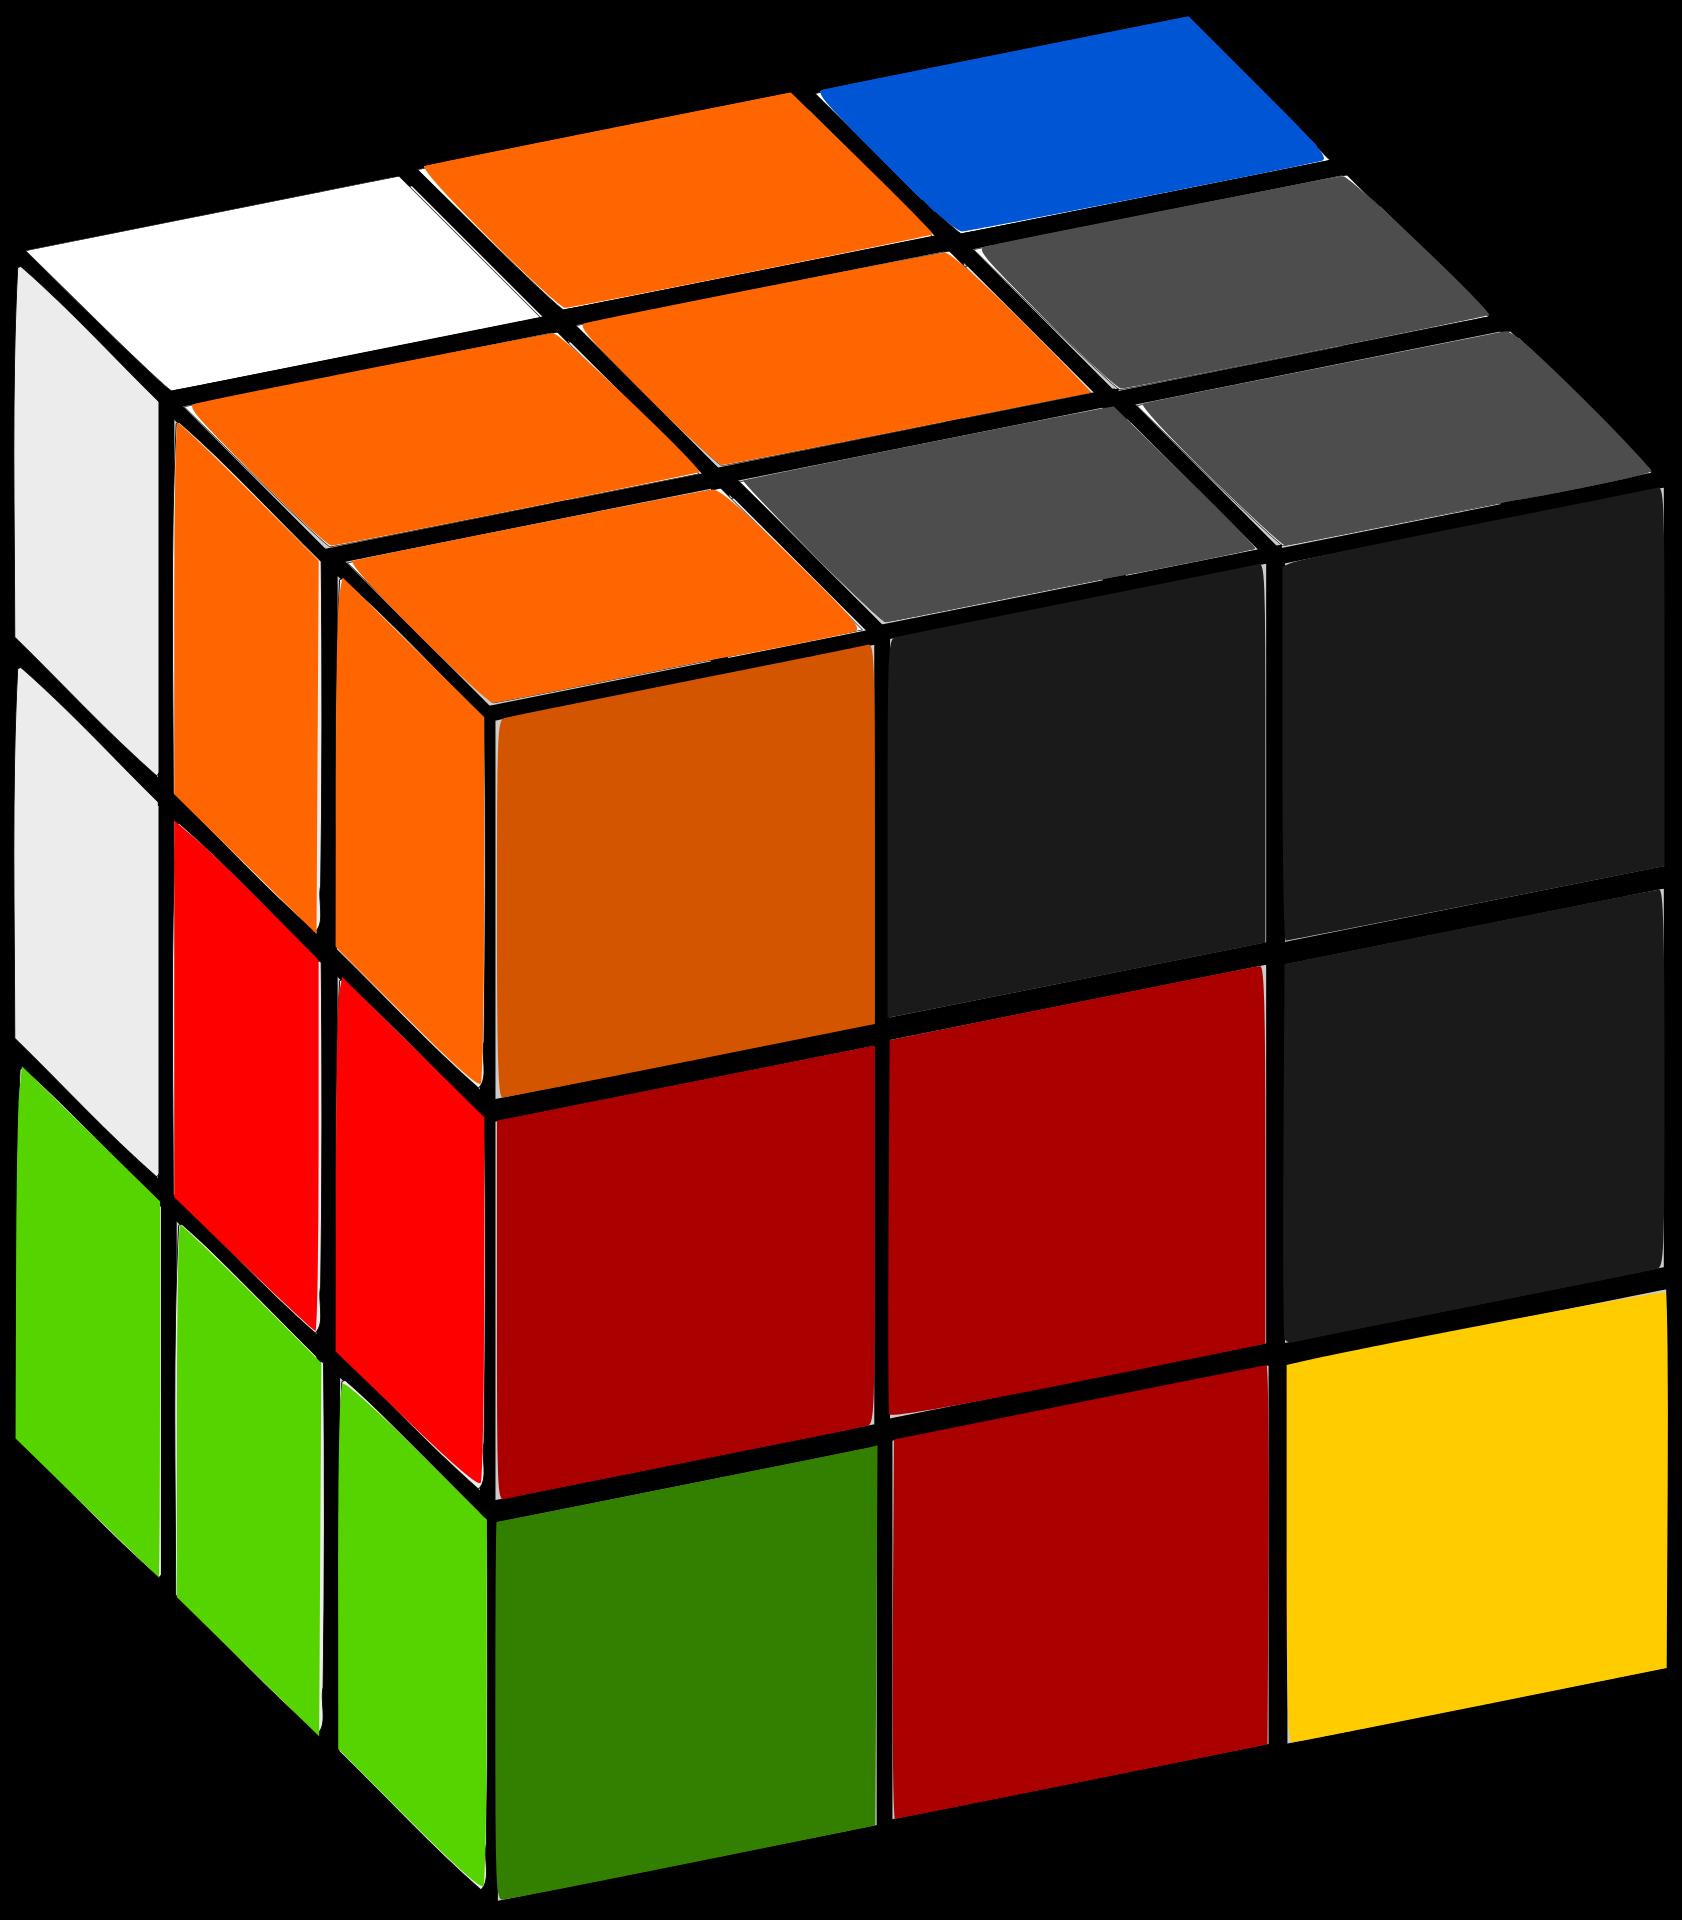 cube-2026724